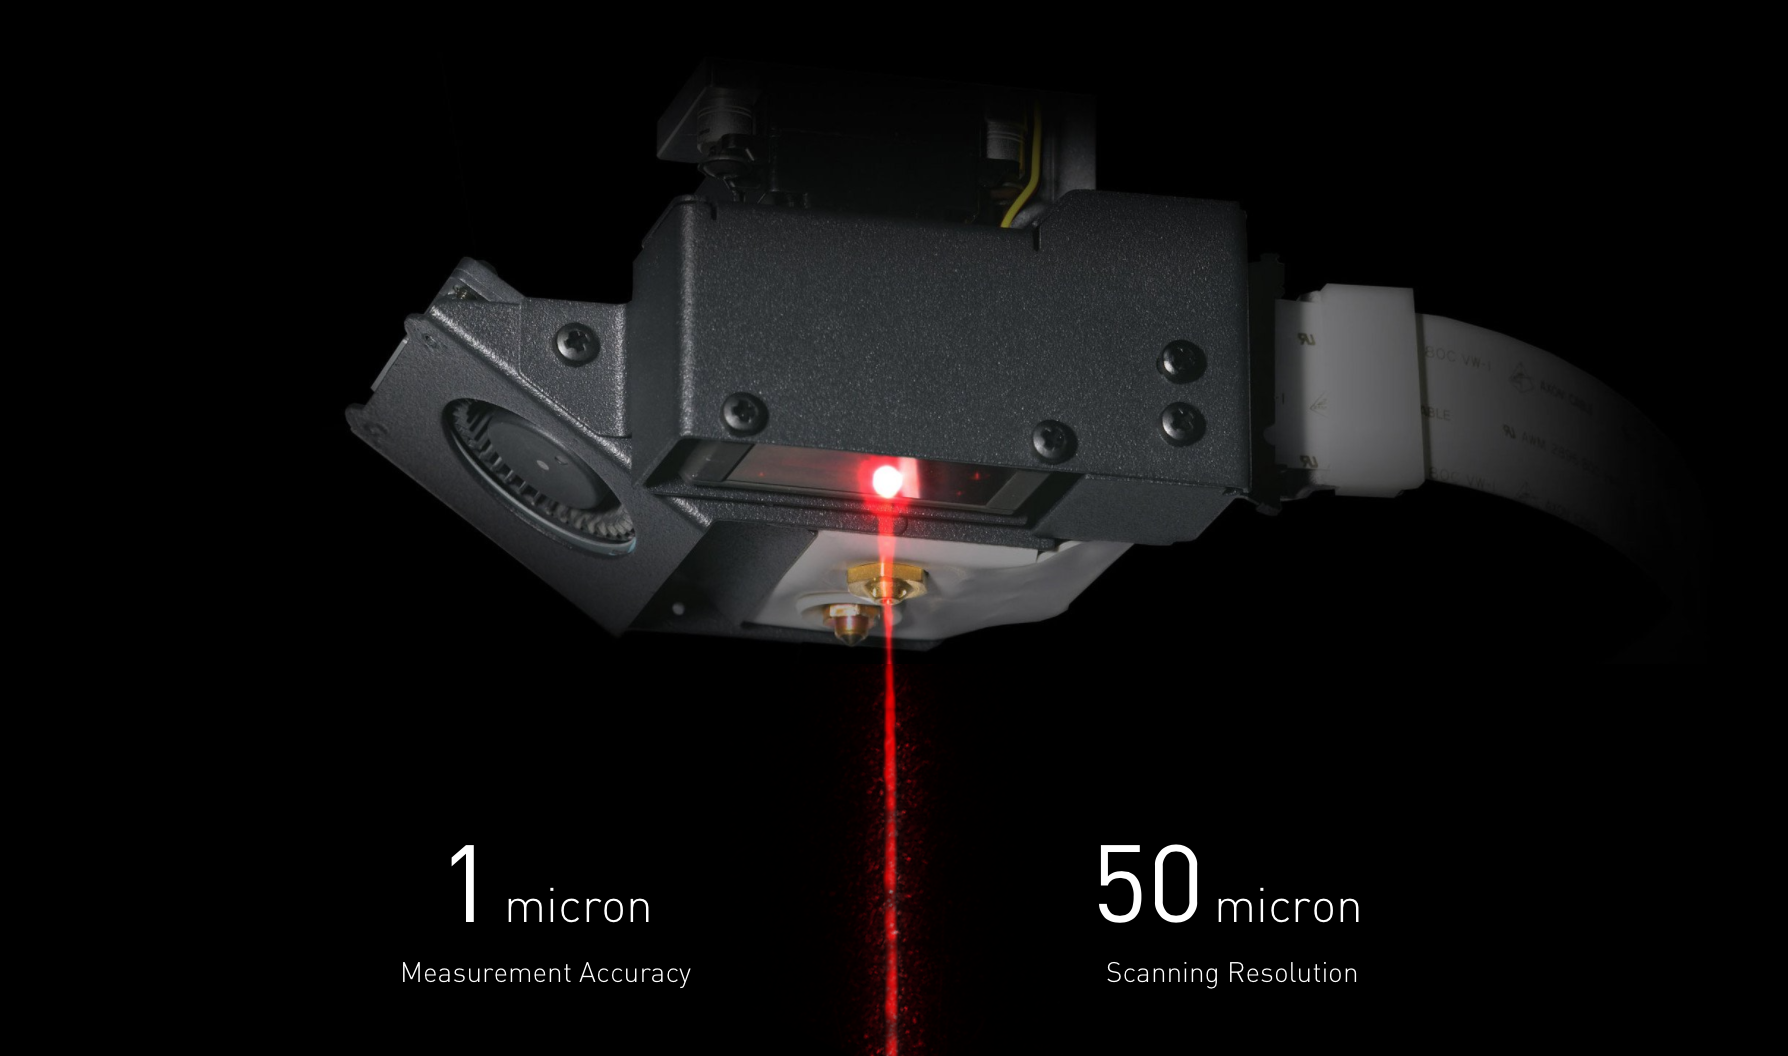 The laser inside MarkForged's Metal X 3D printer. Photo via: markforged